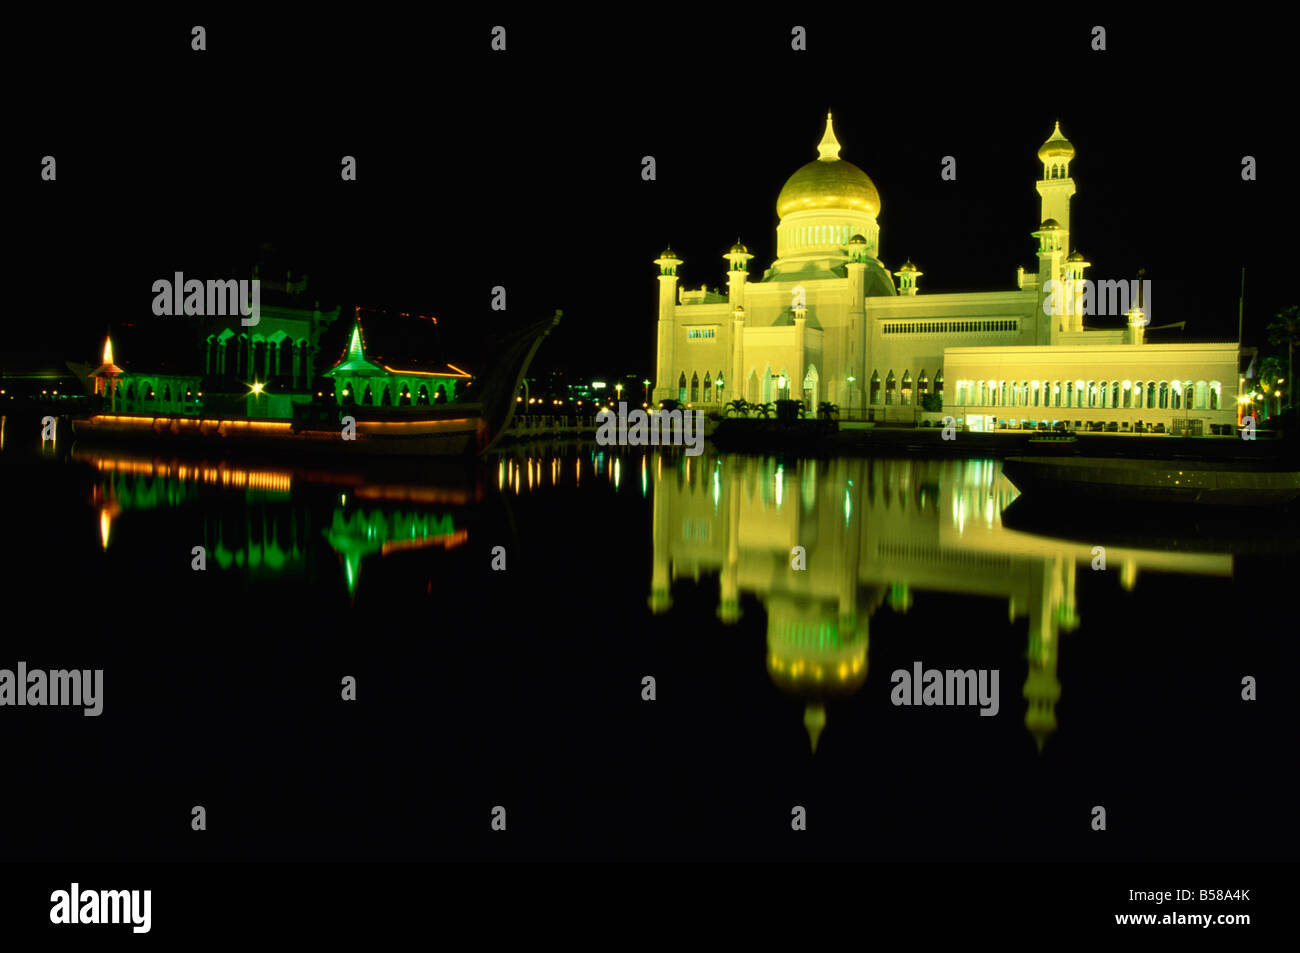 The Omar Ali Saifuddin Mosque built in 1958, Bandar Seri Begawan, Brunei Darussalam, Borneo, Southeast Asia - Stock Image